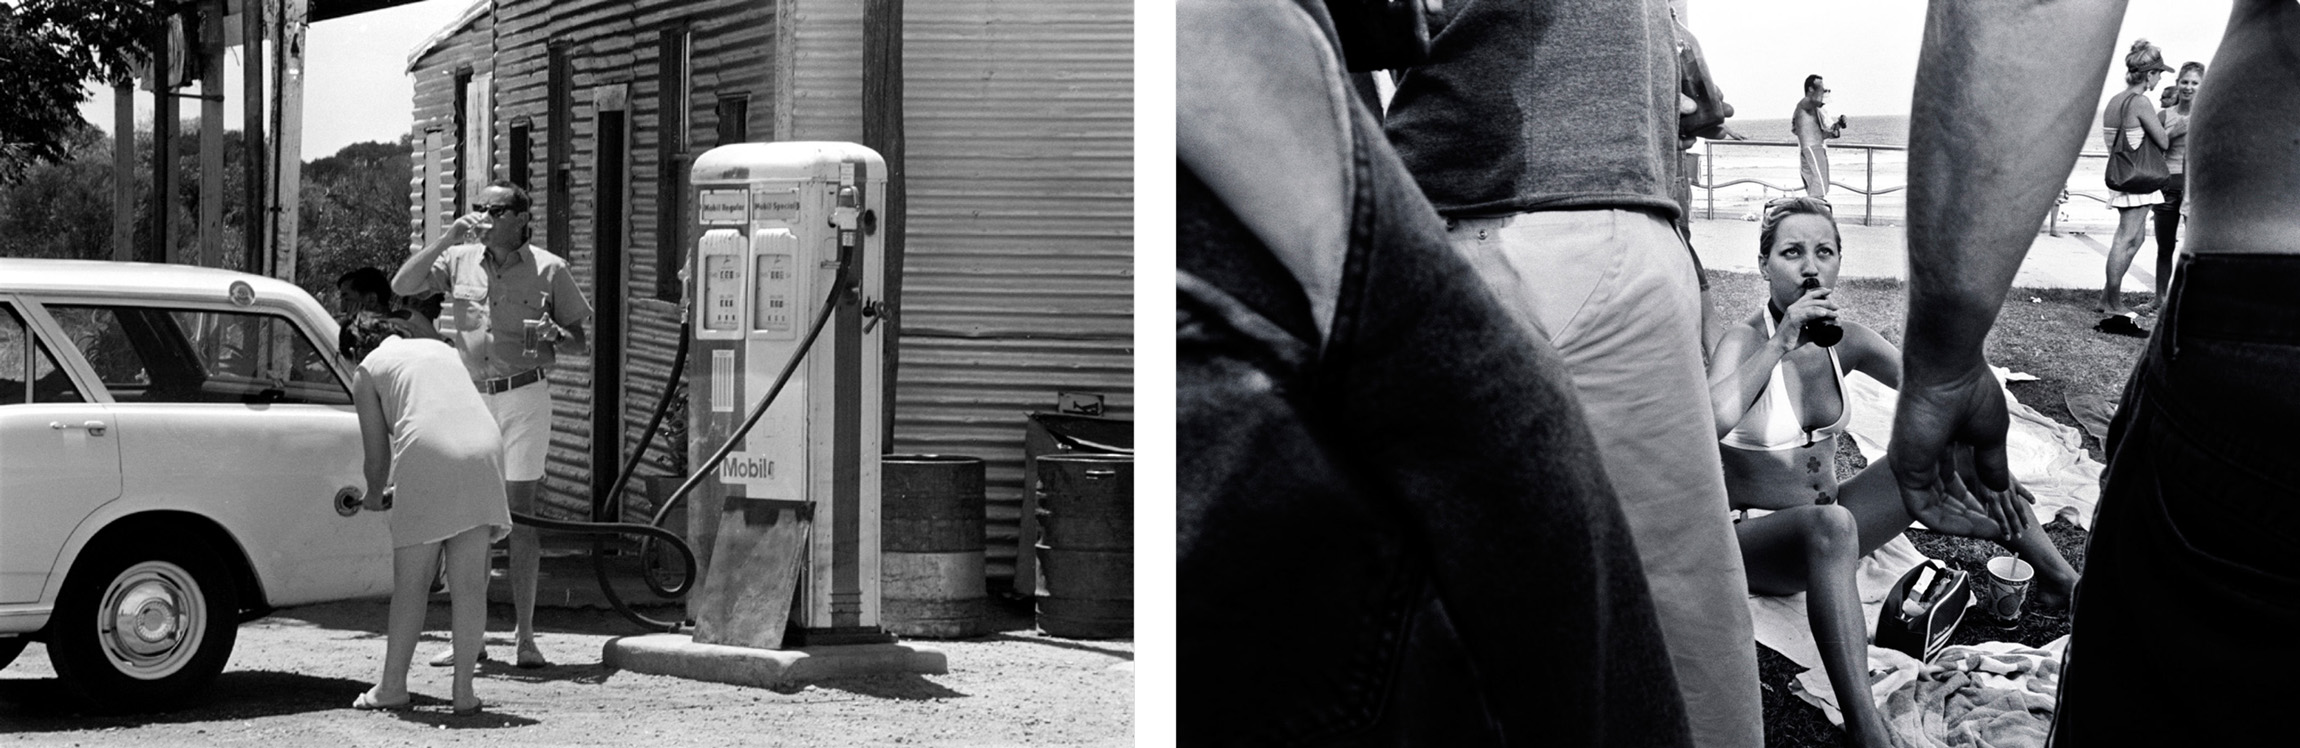 iris, irismagazine, iris magazine, Paul Blackmore, Rennie Ellis, Australian Photography